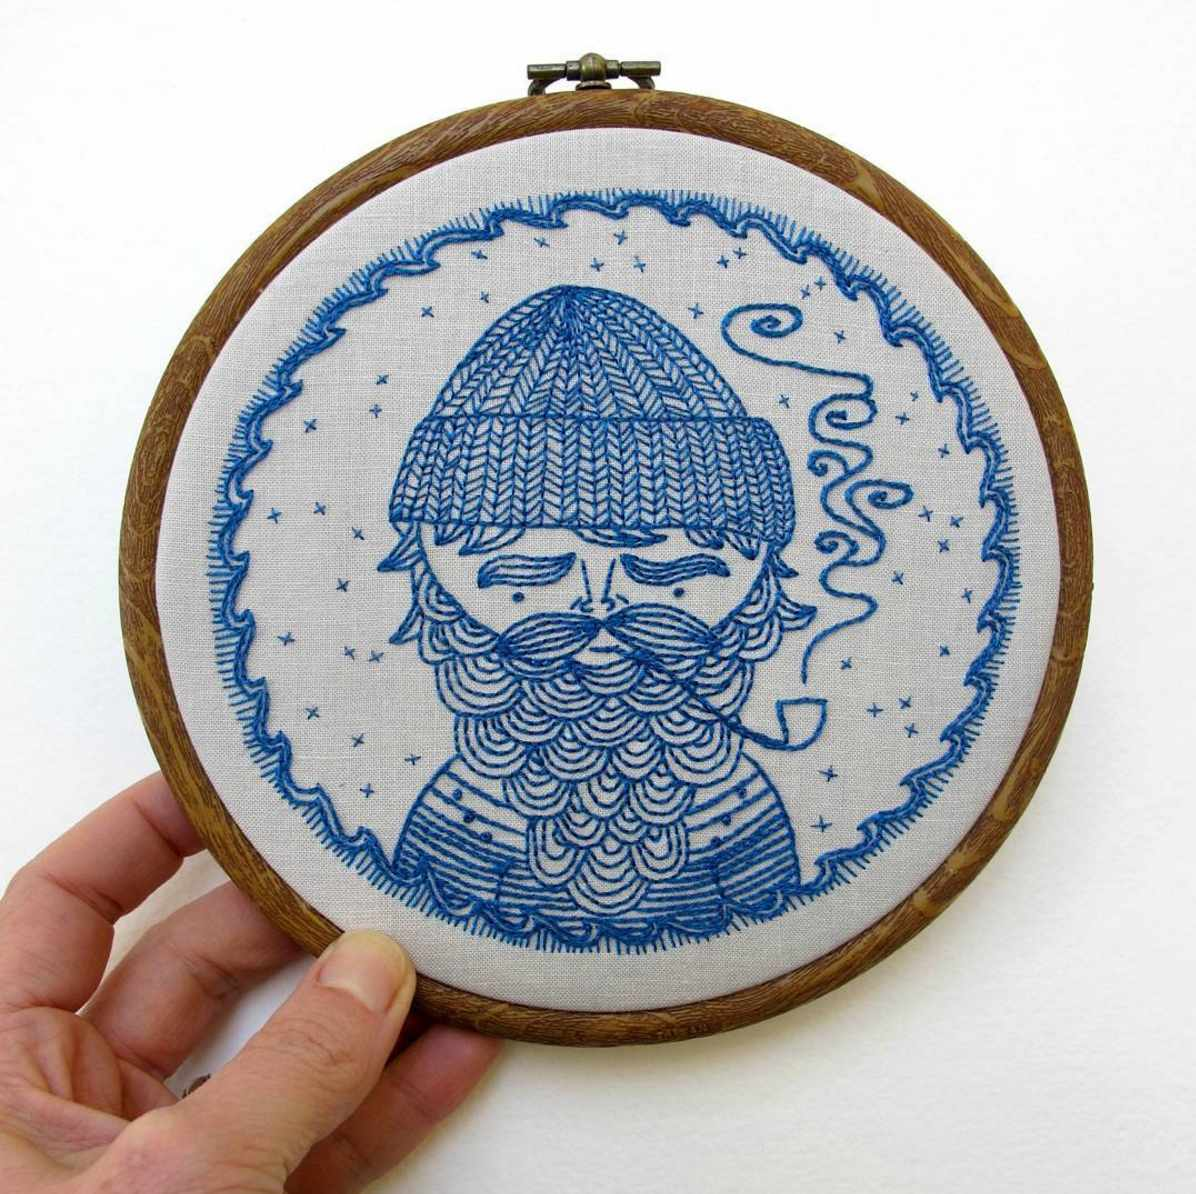 Beautiful Linework and Printed Fabric Patterns